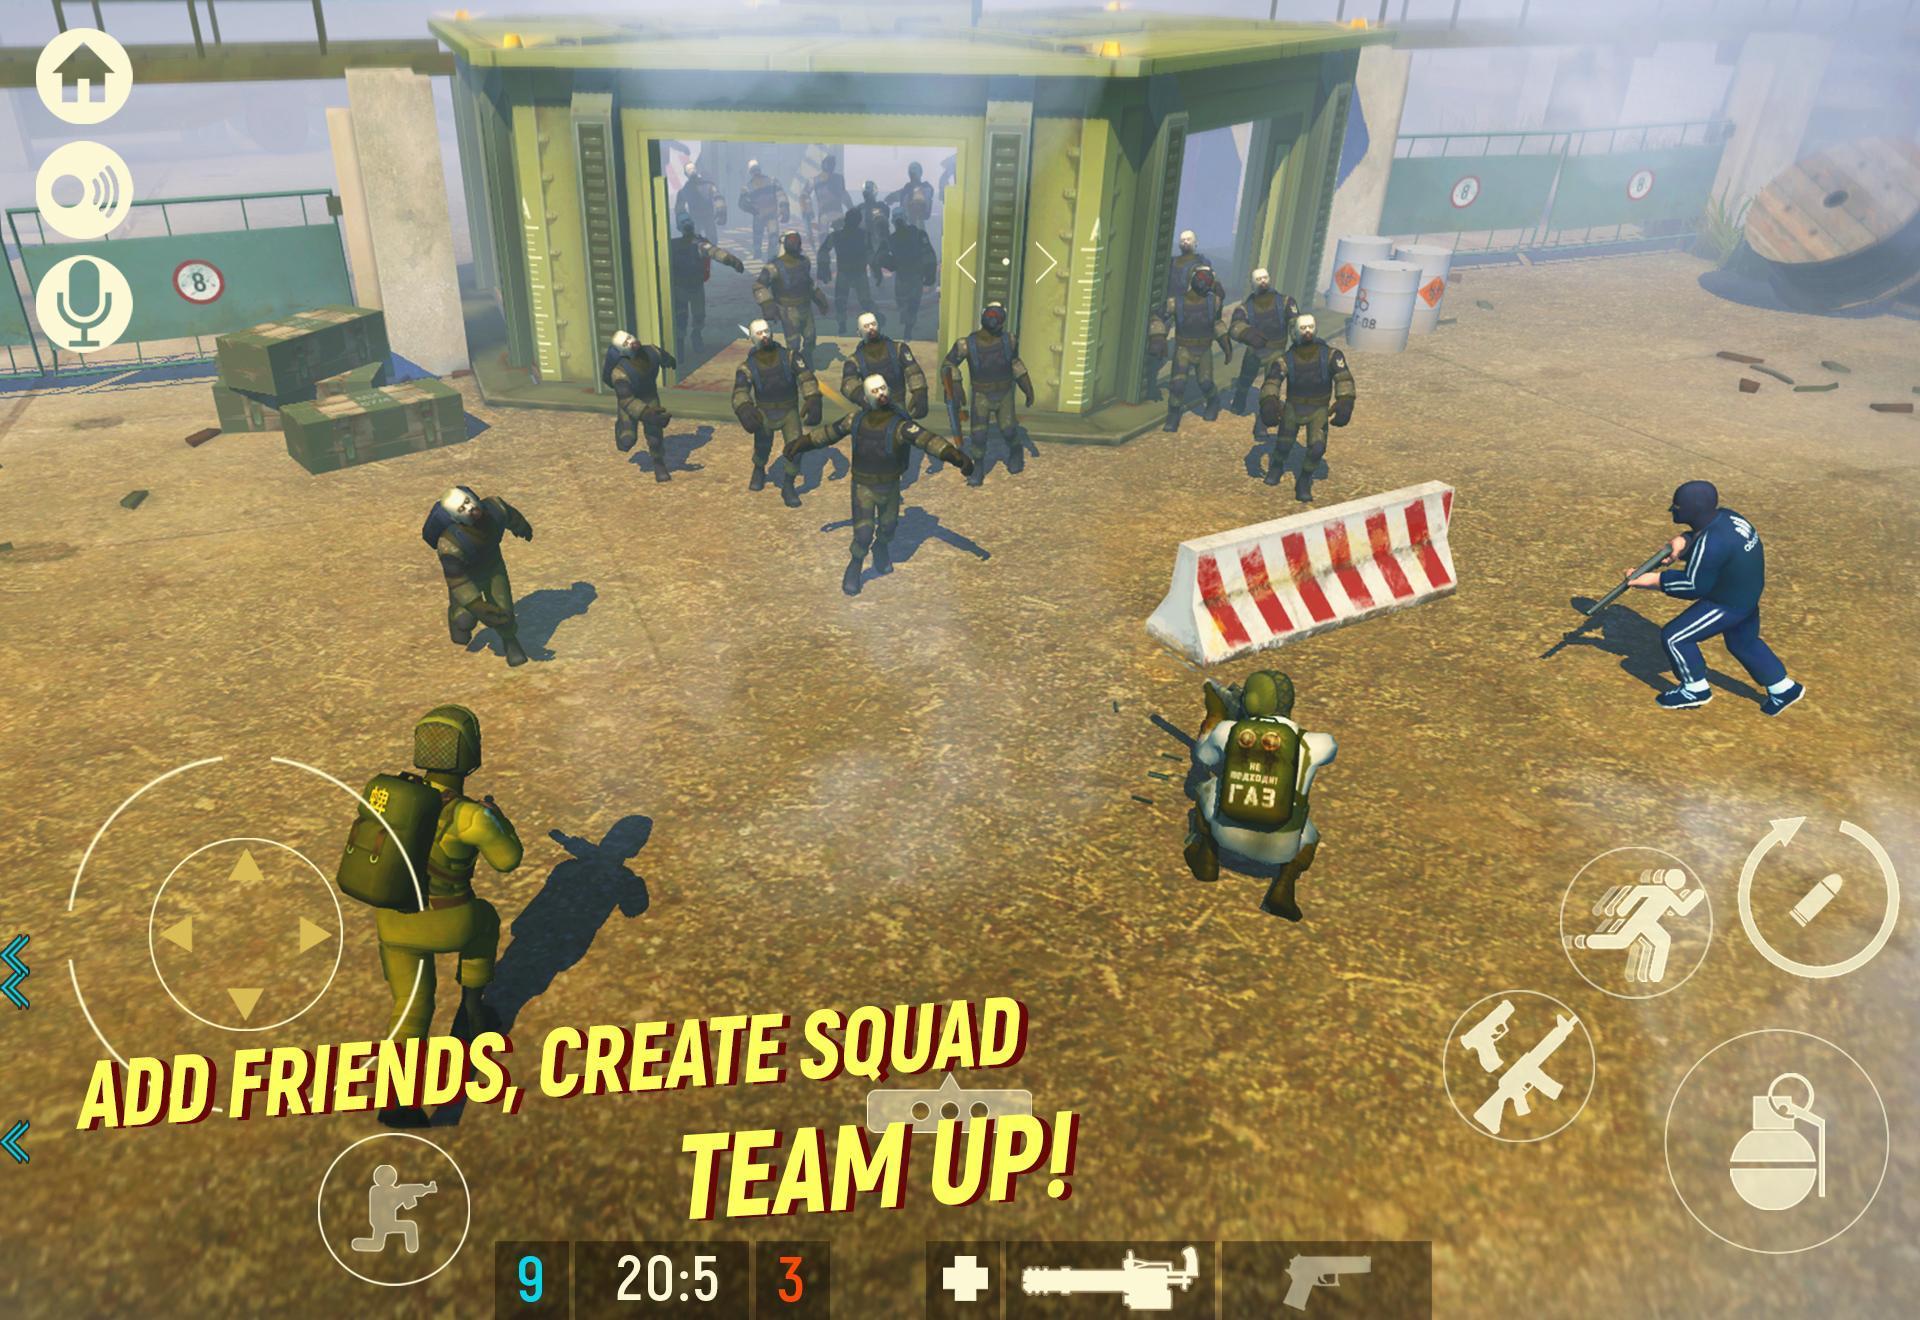 Tacticool 5v5 shooter 1.31.0 Screenshot 5